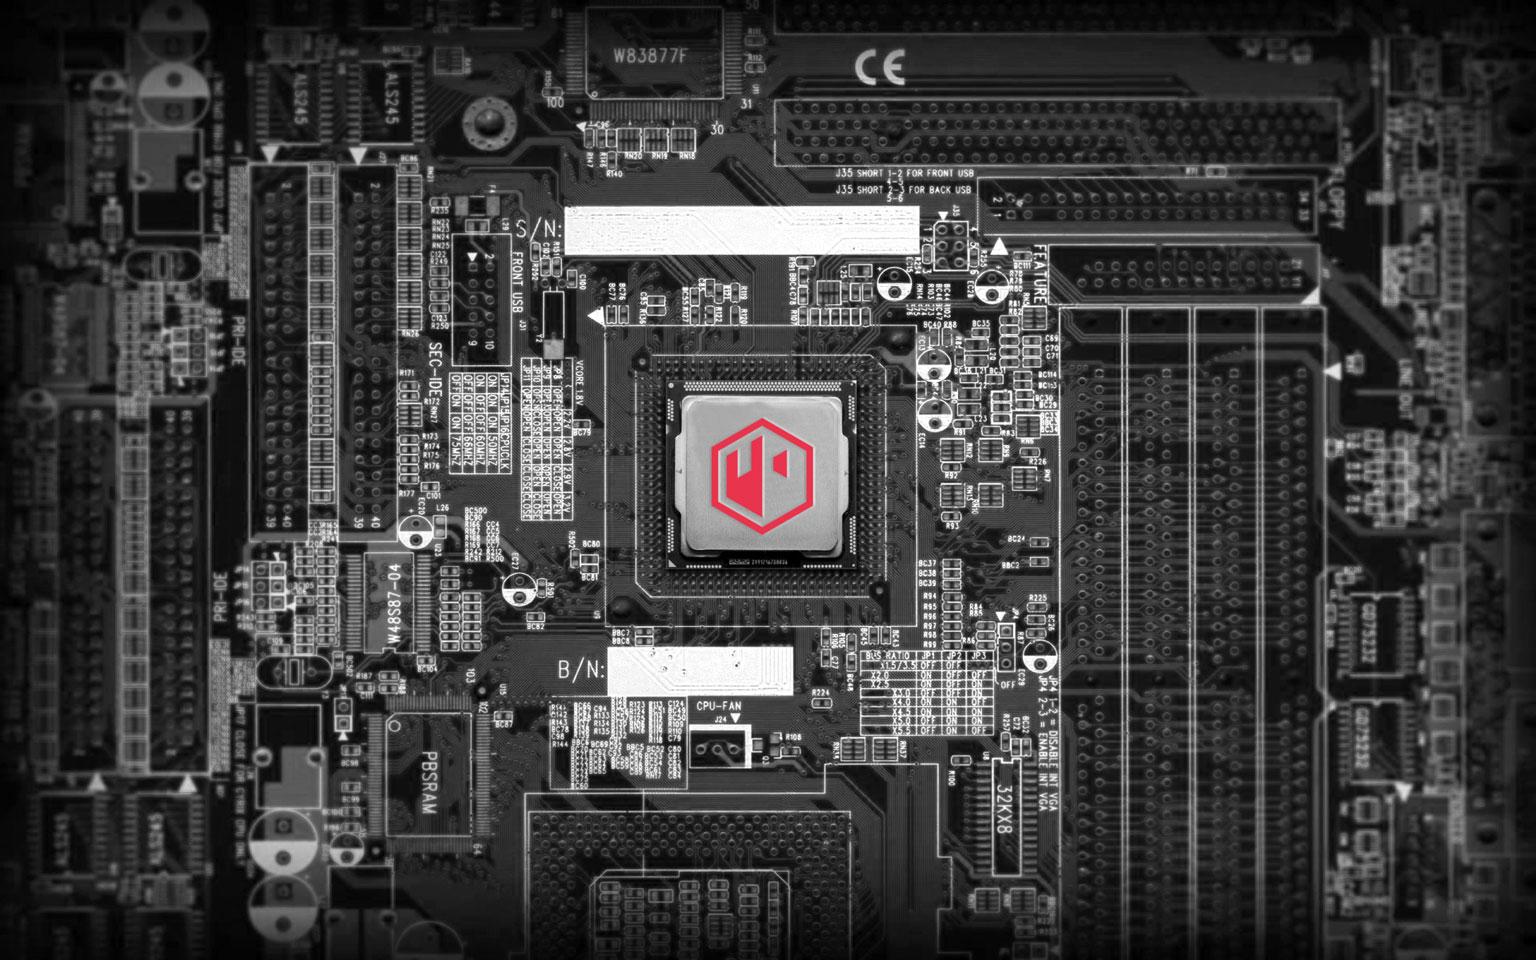 Sfeerafbeelding van moederbord met 072-PC embleem op processor